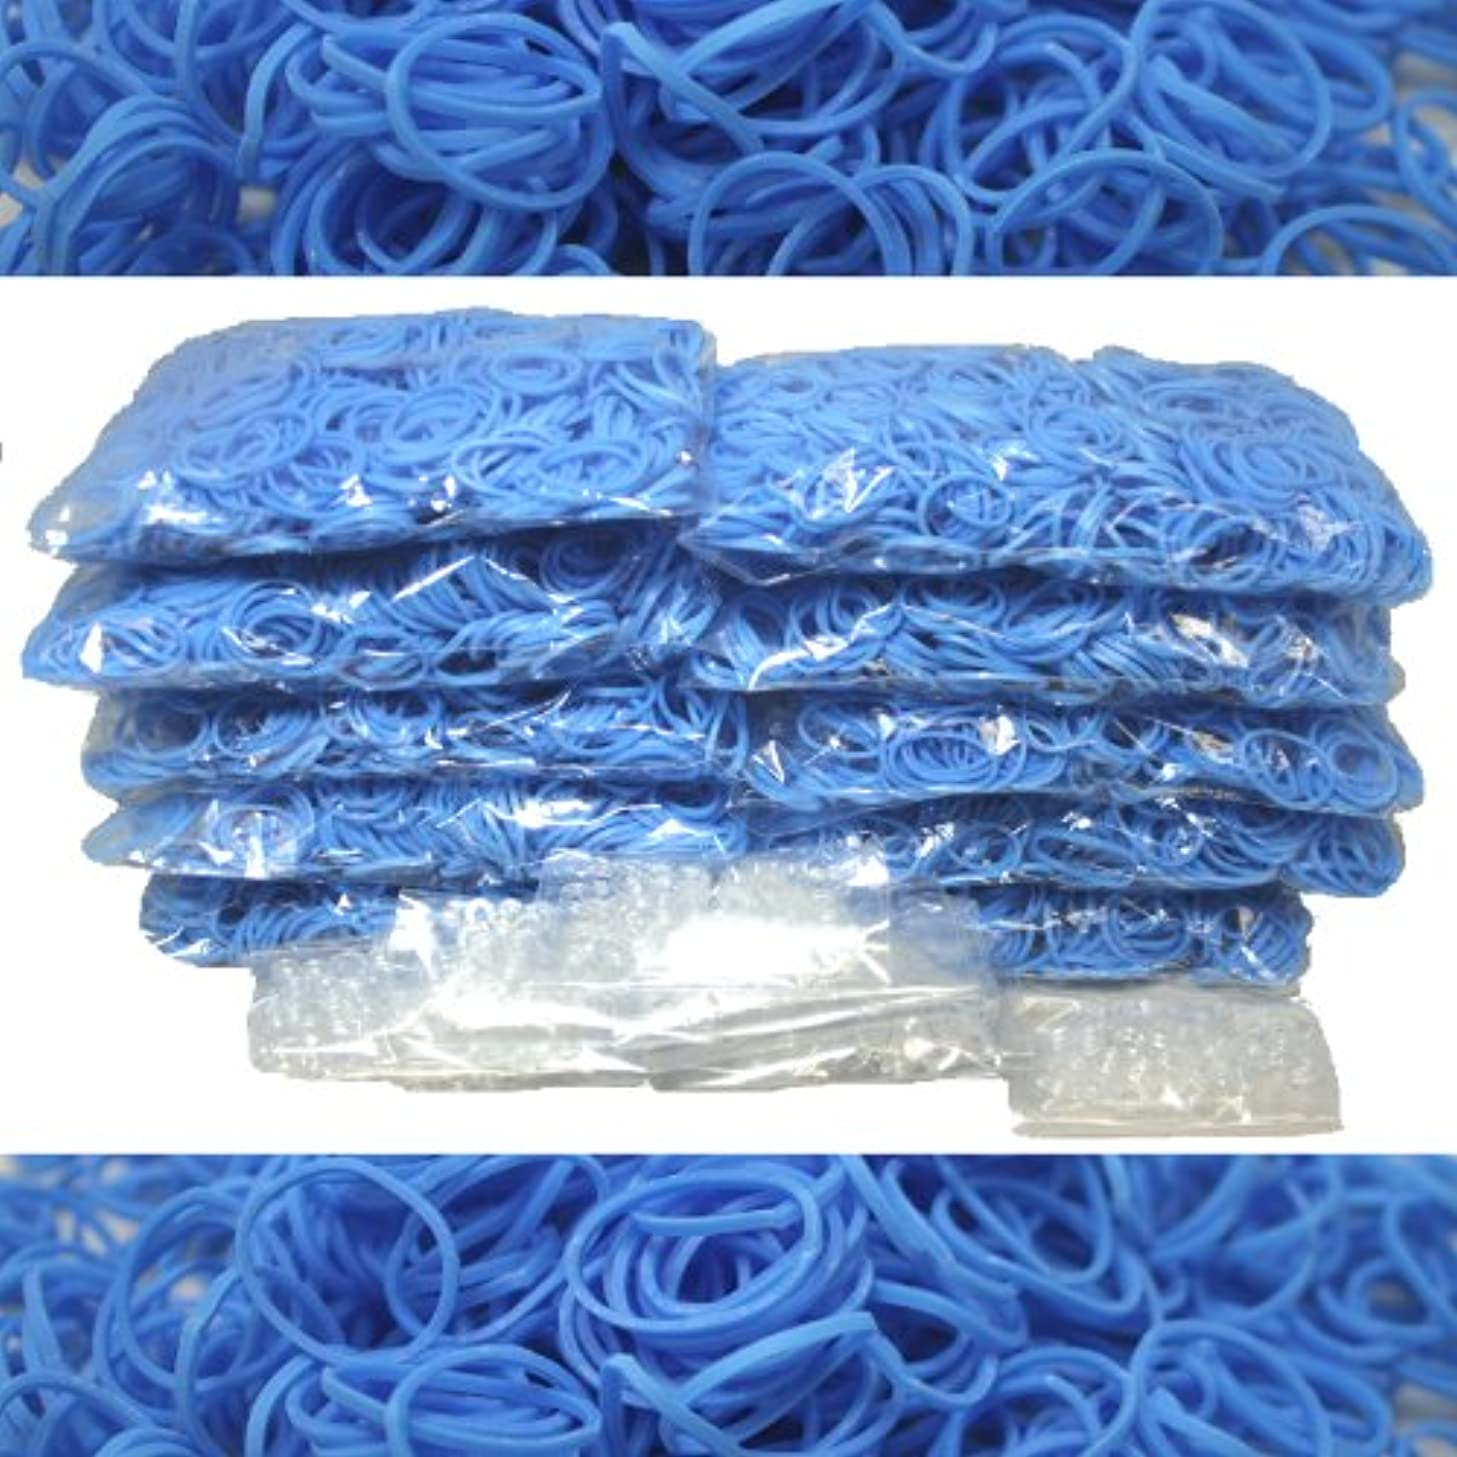 Bluedot Trading 6000-Piece Light Blue Rubber Band Kids Craft with Rainbow Bracelet Kit Refill Pack